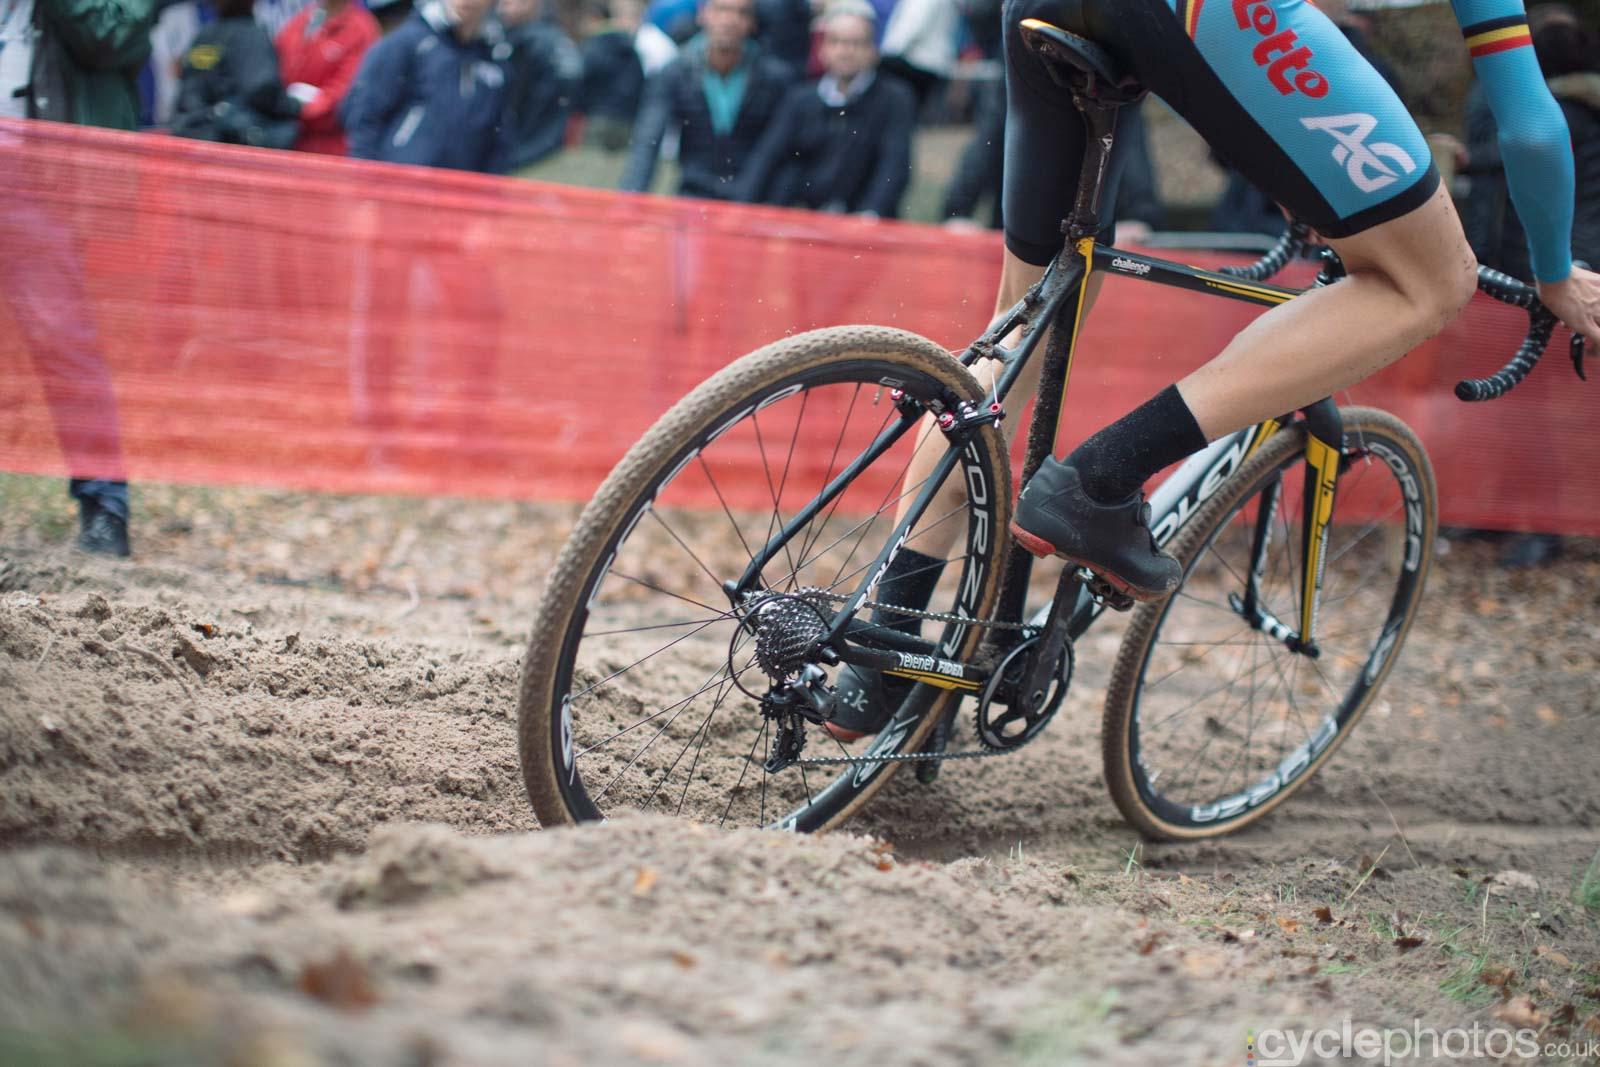 2015-cyclephotos-cyclocross-eucx-huijbergen-124748-sram-cx-drivetrain